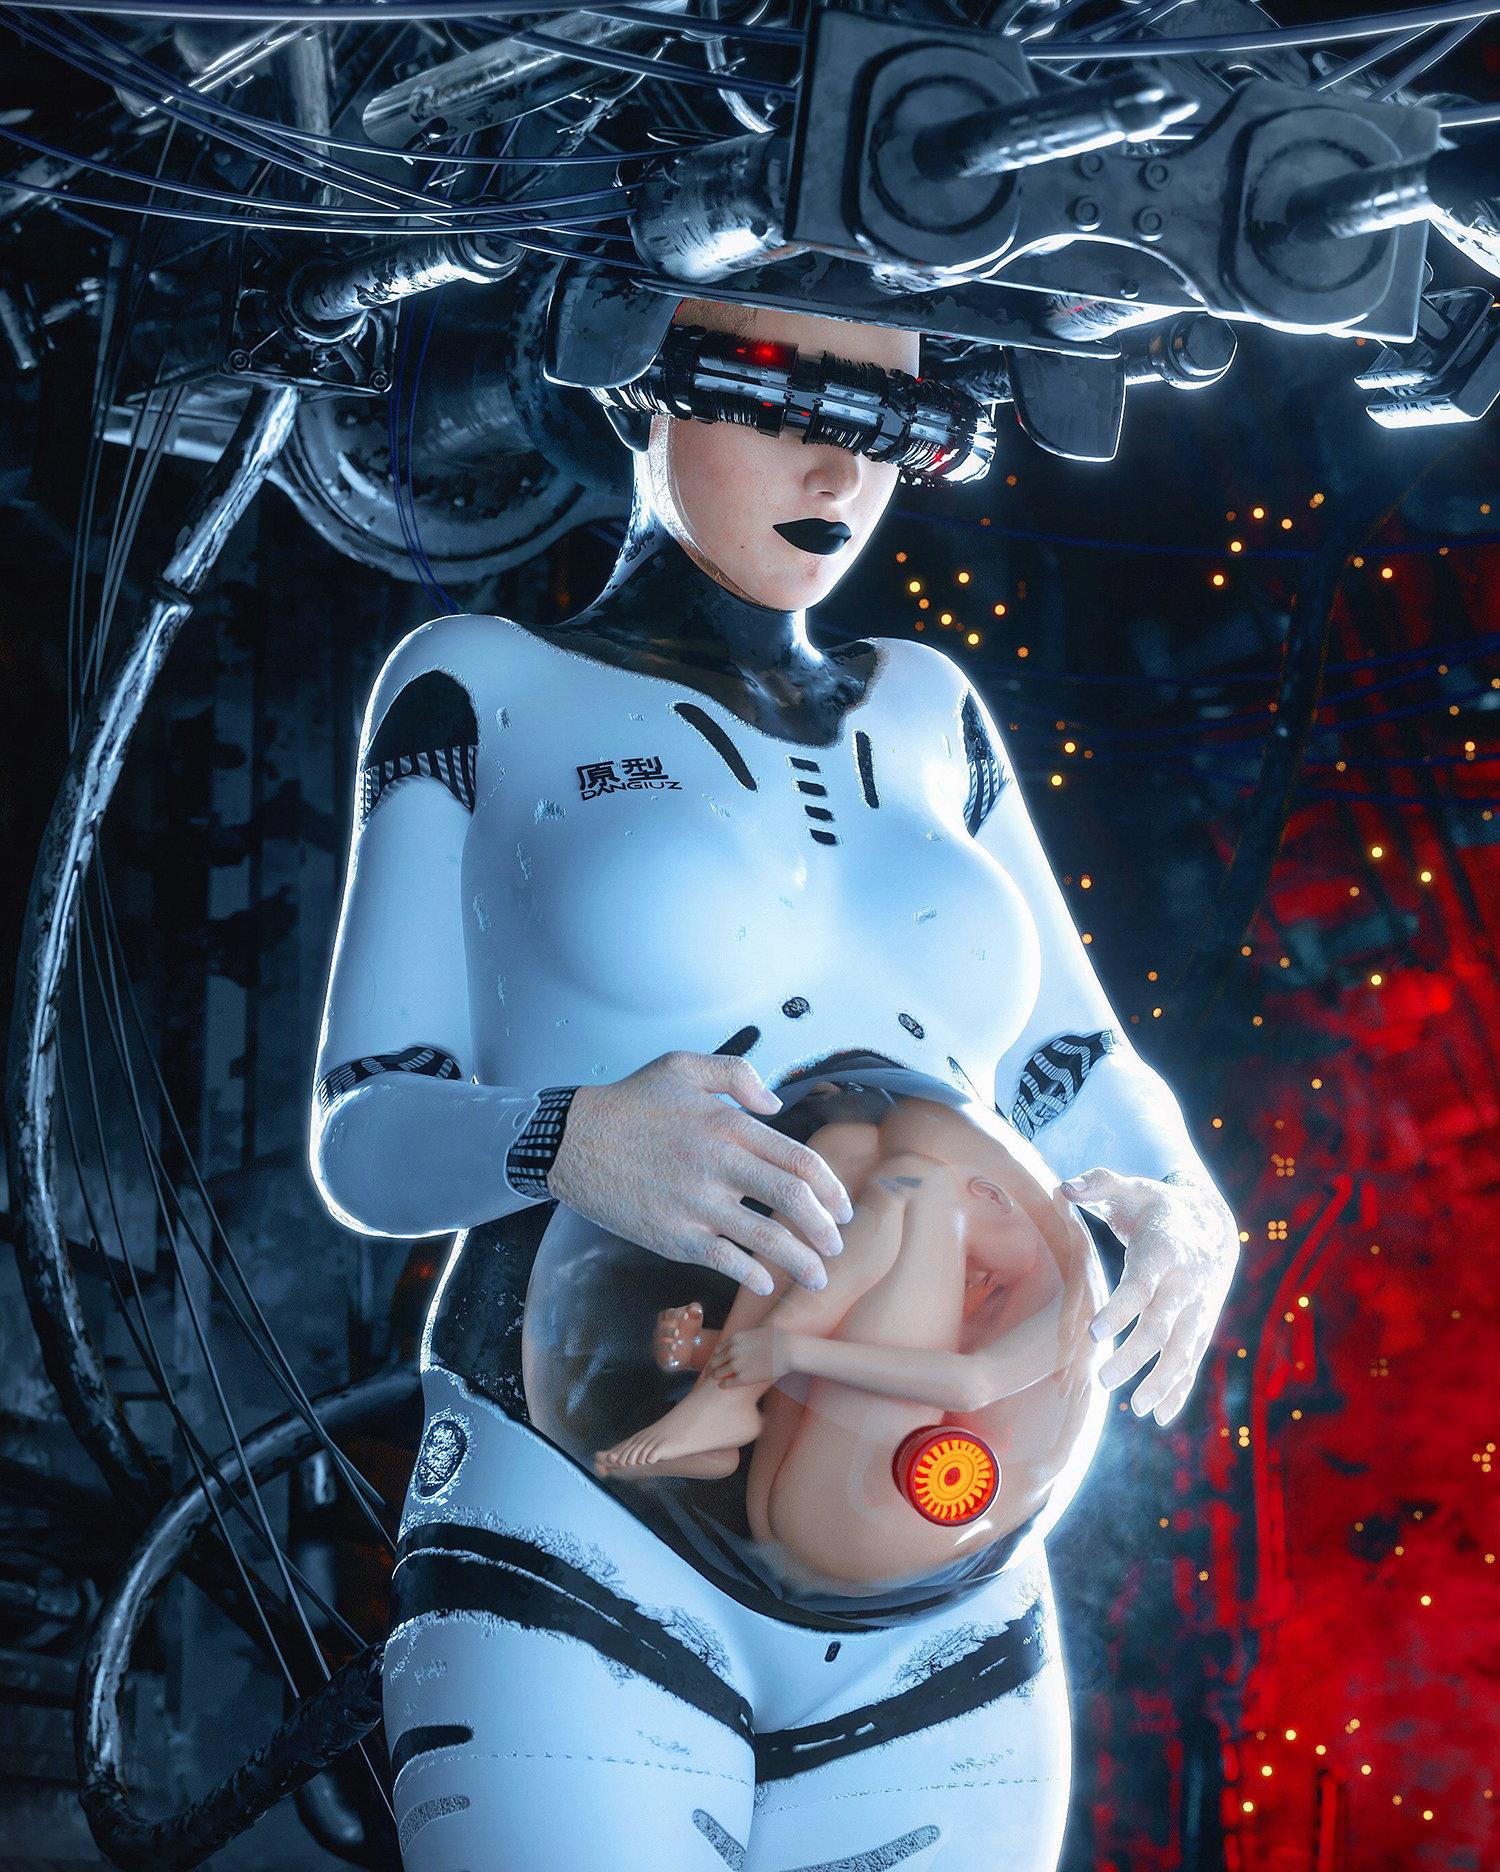 new life, future technology, digital art by by Dangiuz / Leopoldo D'Angelo